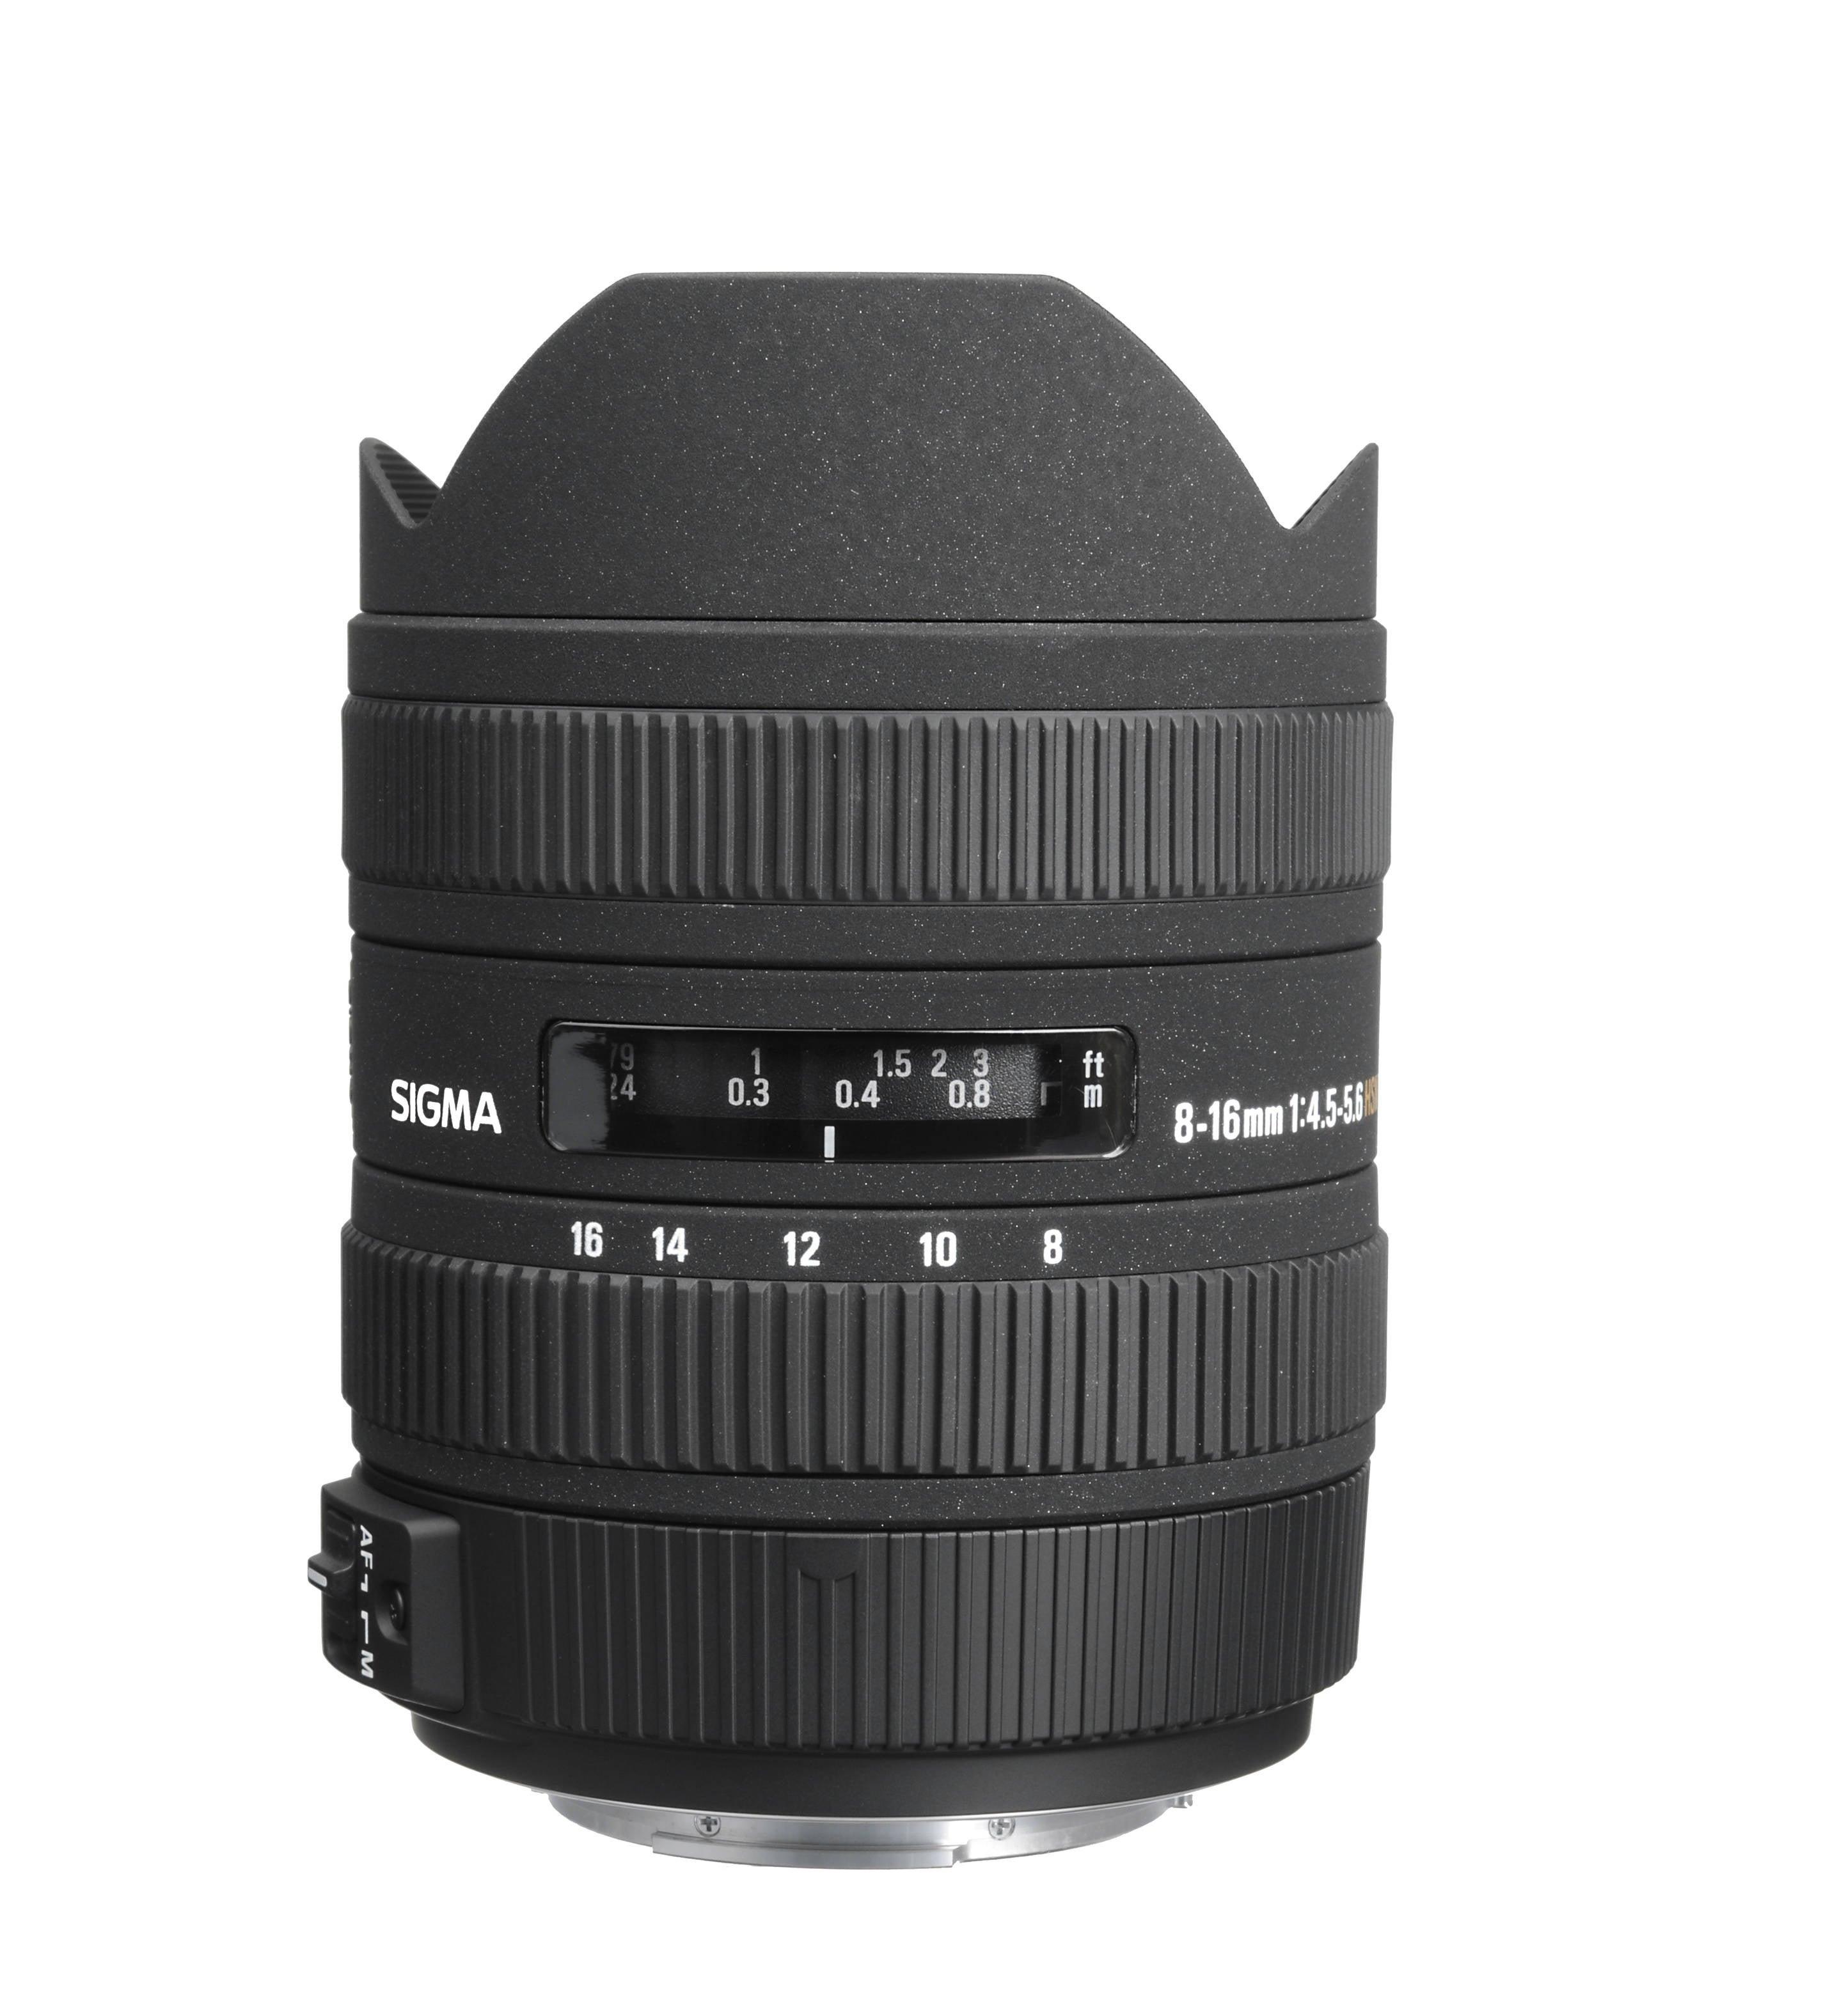 Sigman 8-16mm F4.5-5.6 DC HSM Lens